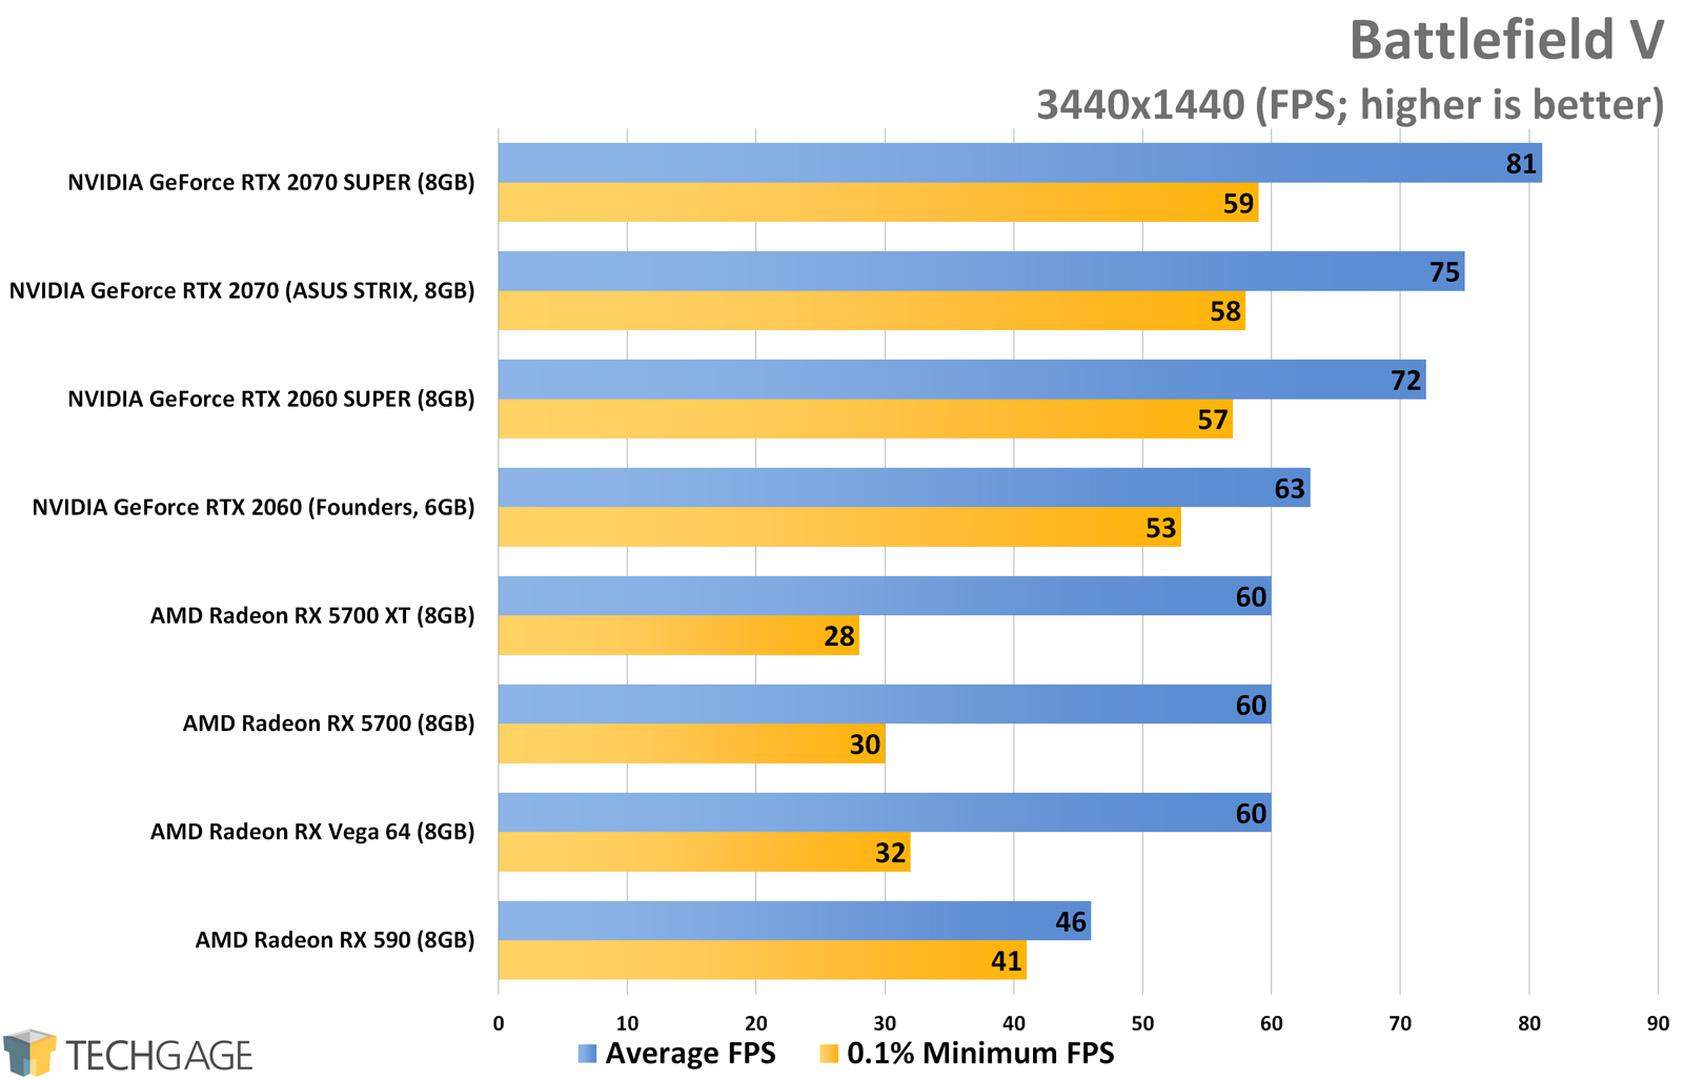 Battlefield V (3440x1440 Ultrawide) - AMD Radeon RX 5700 XT and RX 5700 Performance